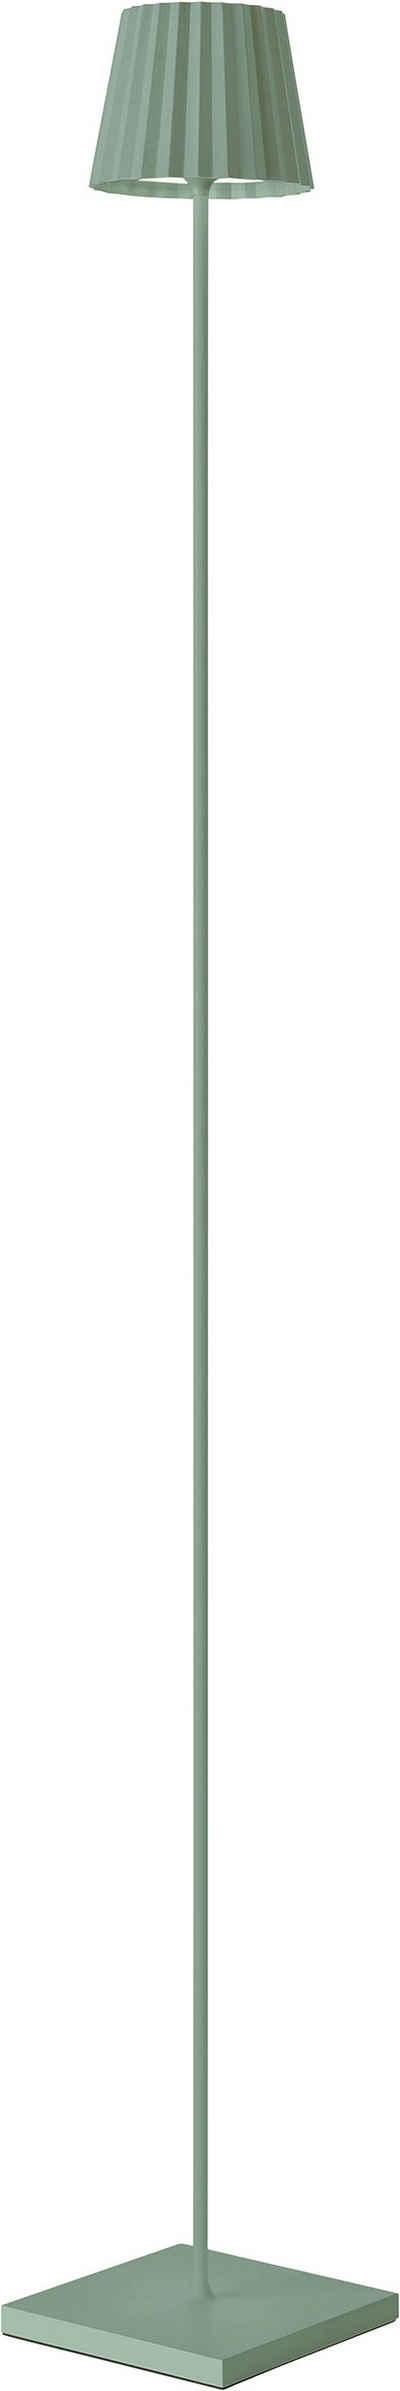 SOMPEX LED Stehlampe »Troll«